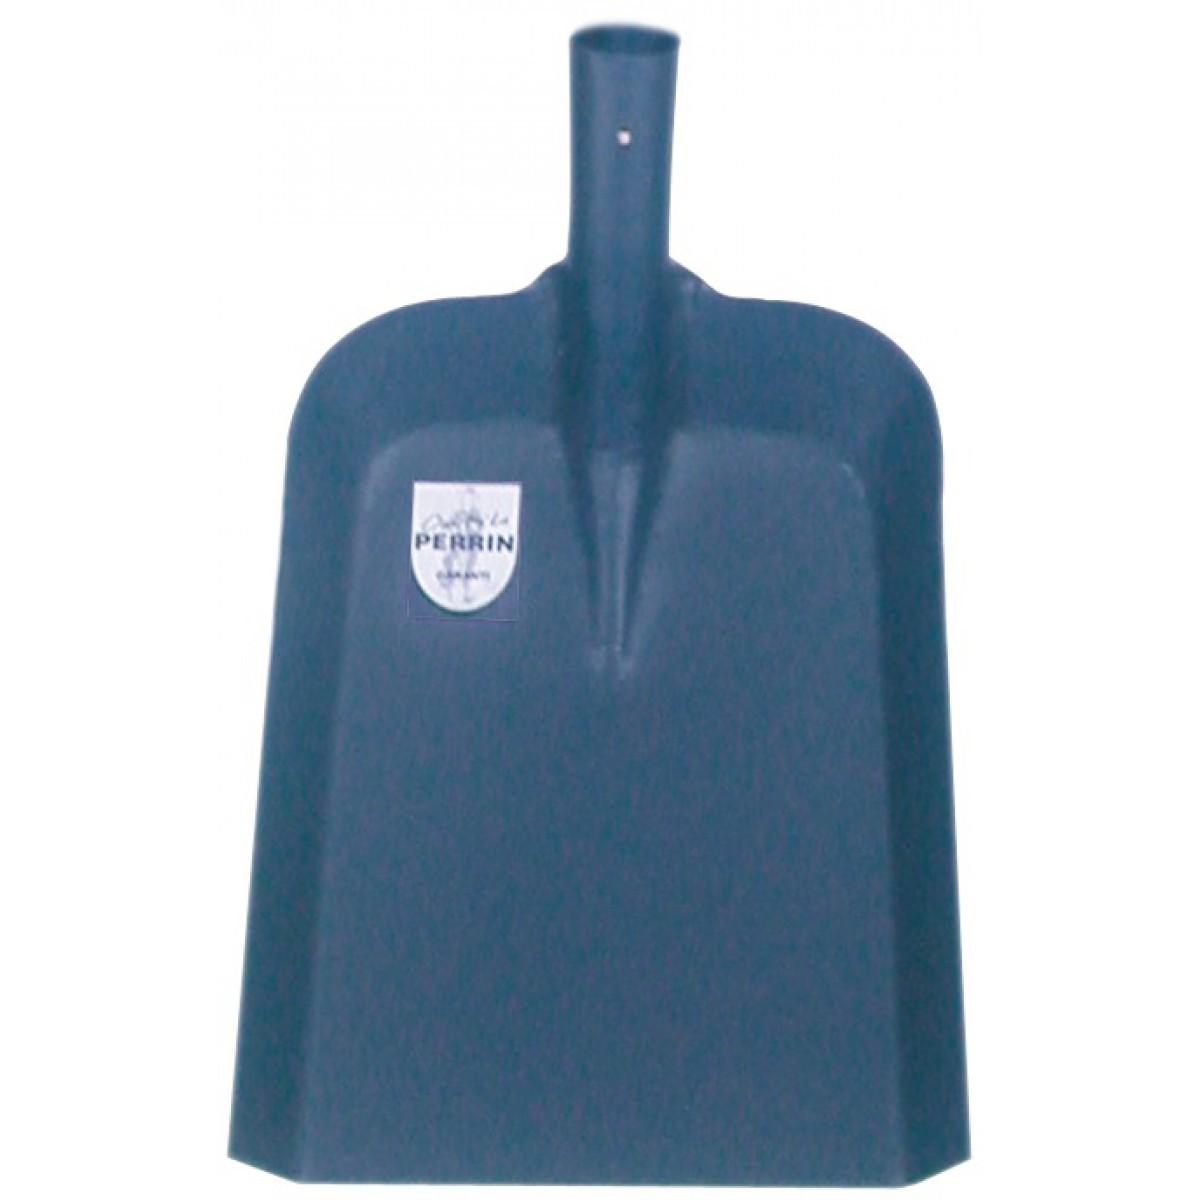 Pelle Angoulème Perrin - Longueur 25 cm